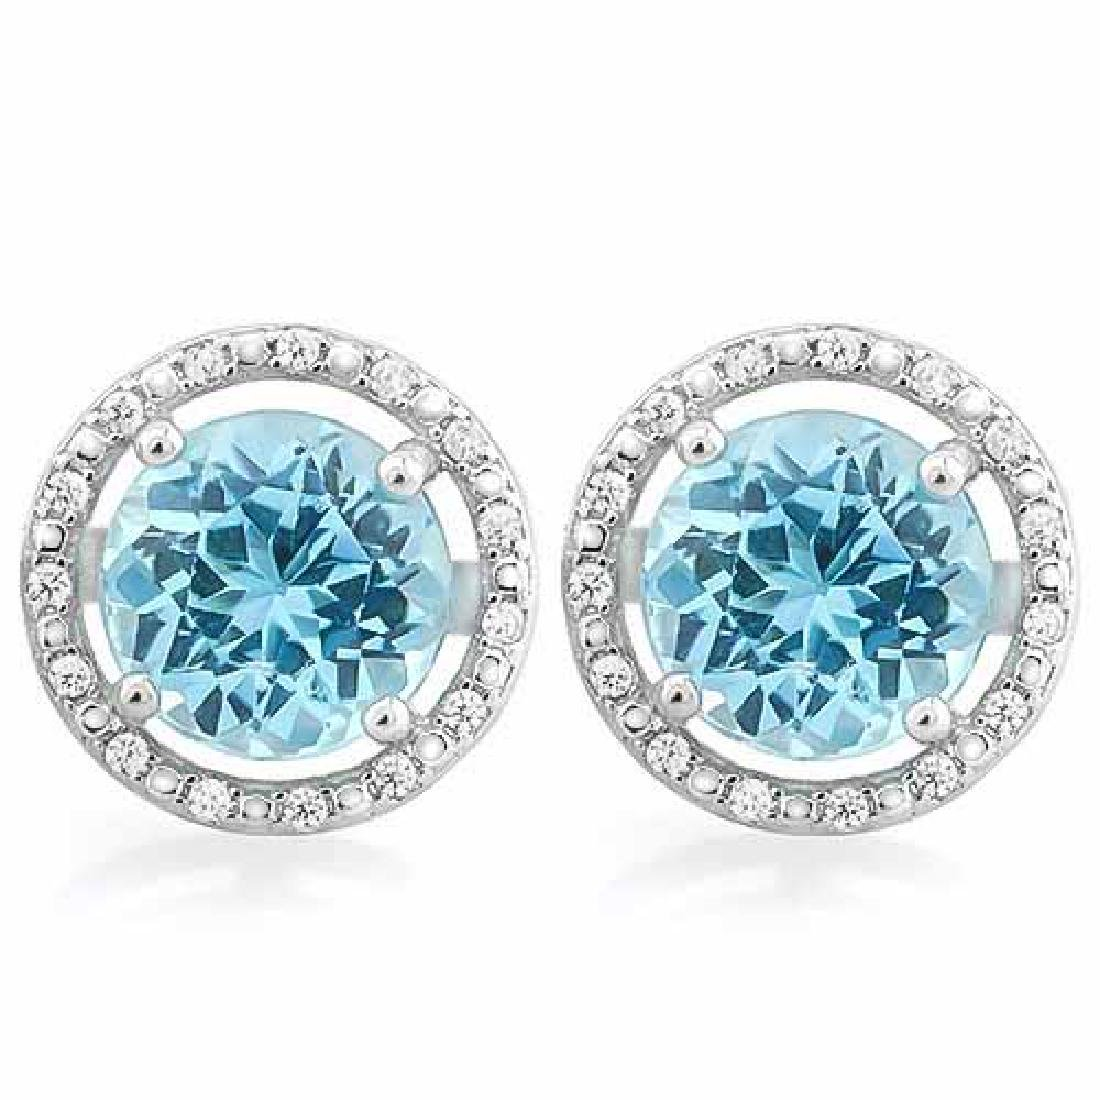 4 2/3 CARAT BABY SWISS BLUE TOPAZ & DIAMOND 925 STERLIN